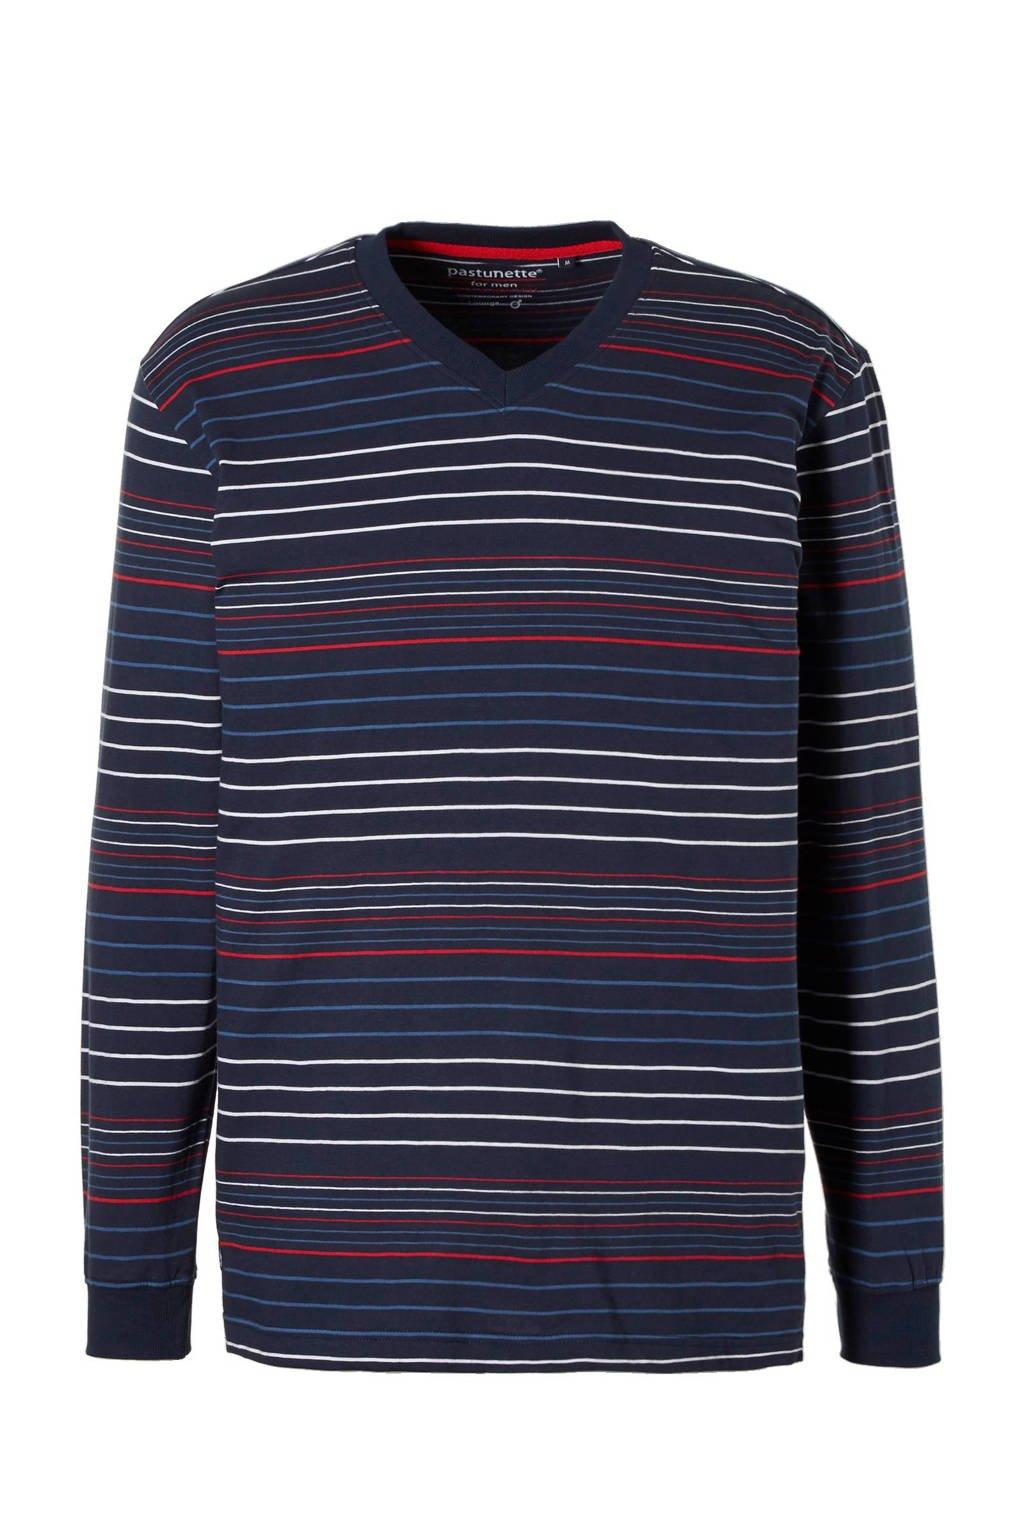 Pastunette for men pyjamatop marine/wit/rood, Marine/wit/rood